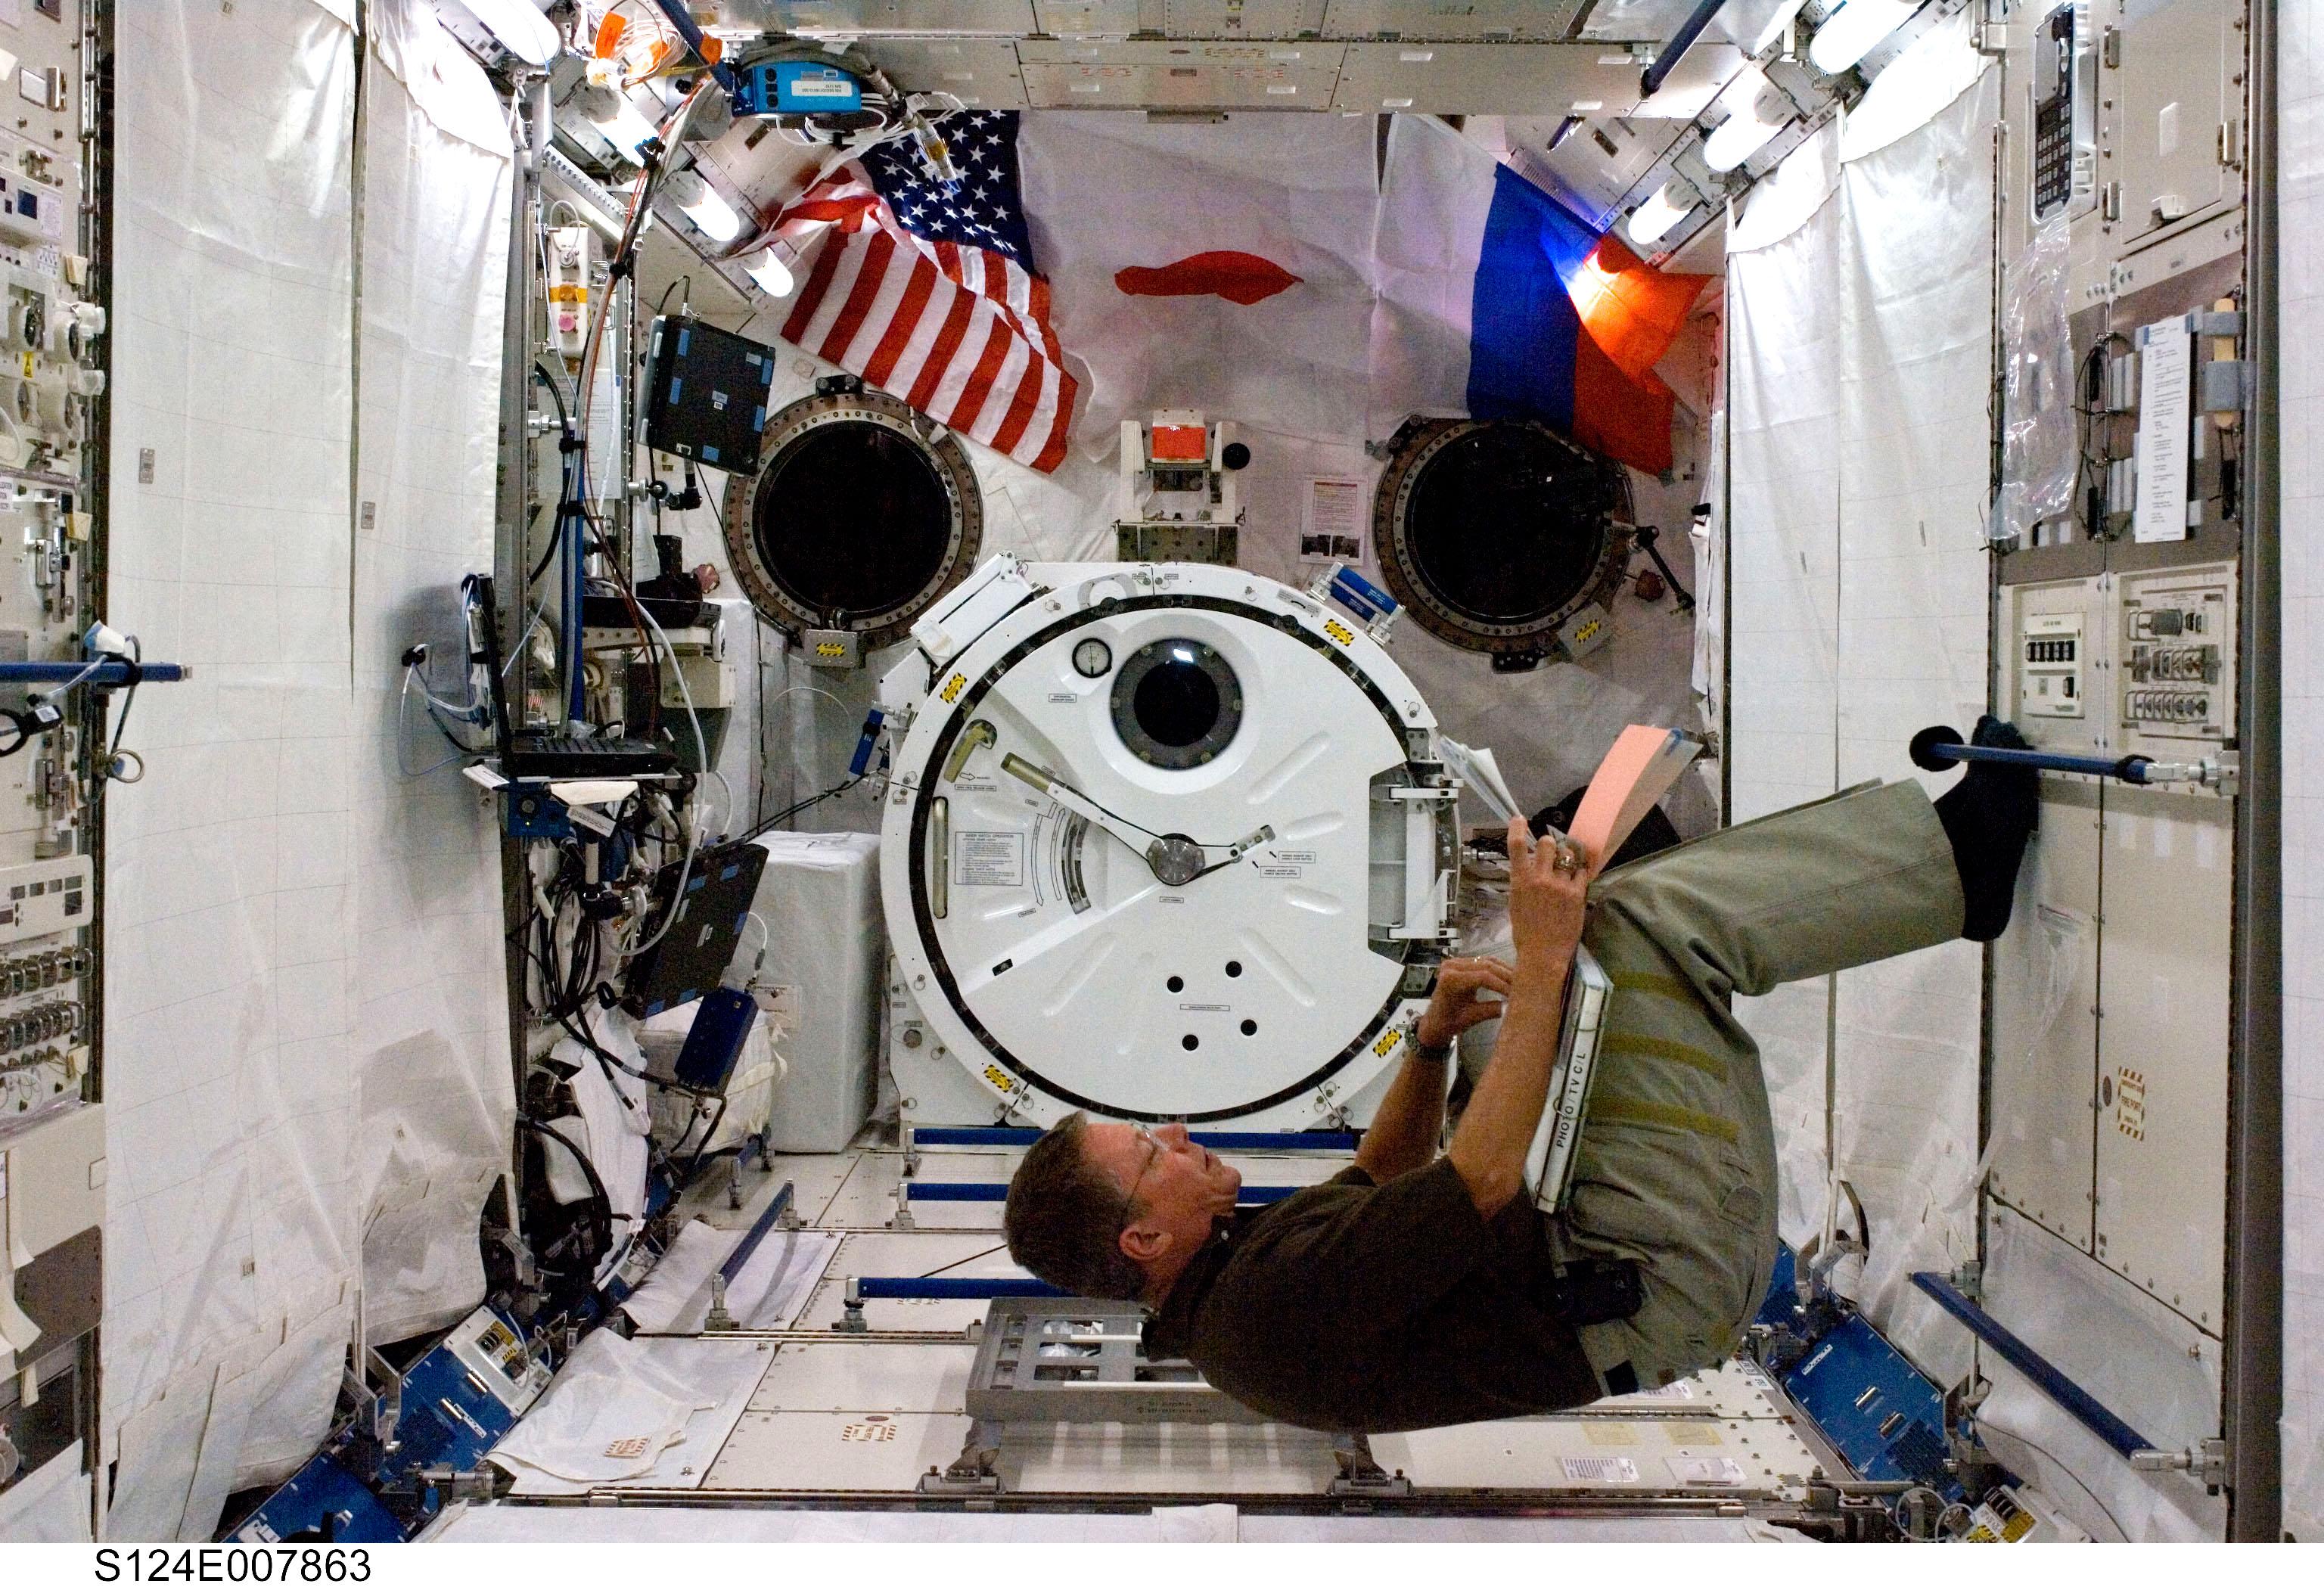 International Space Station 121 MB